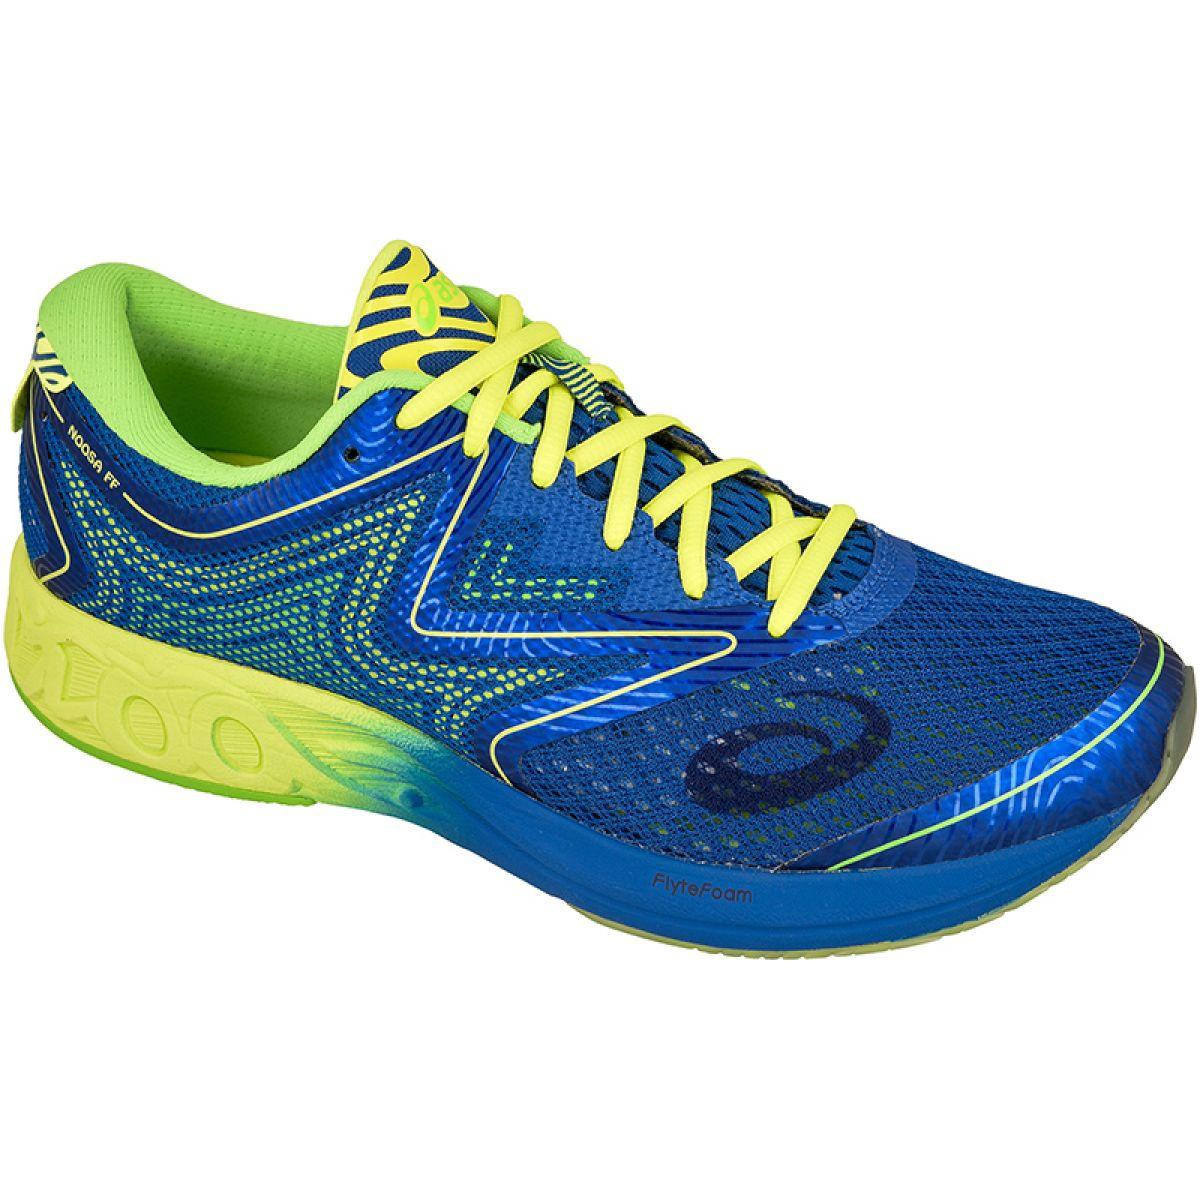 monitor Involucrado Ewell  Running shoes Asics Noosa Ff M T722N-4507 blue - ButyModne.pl